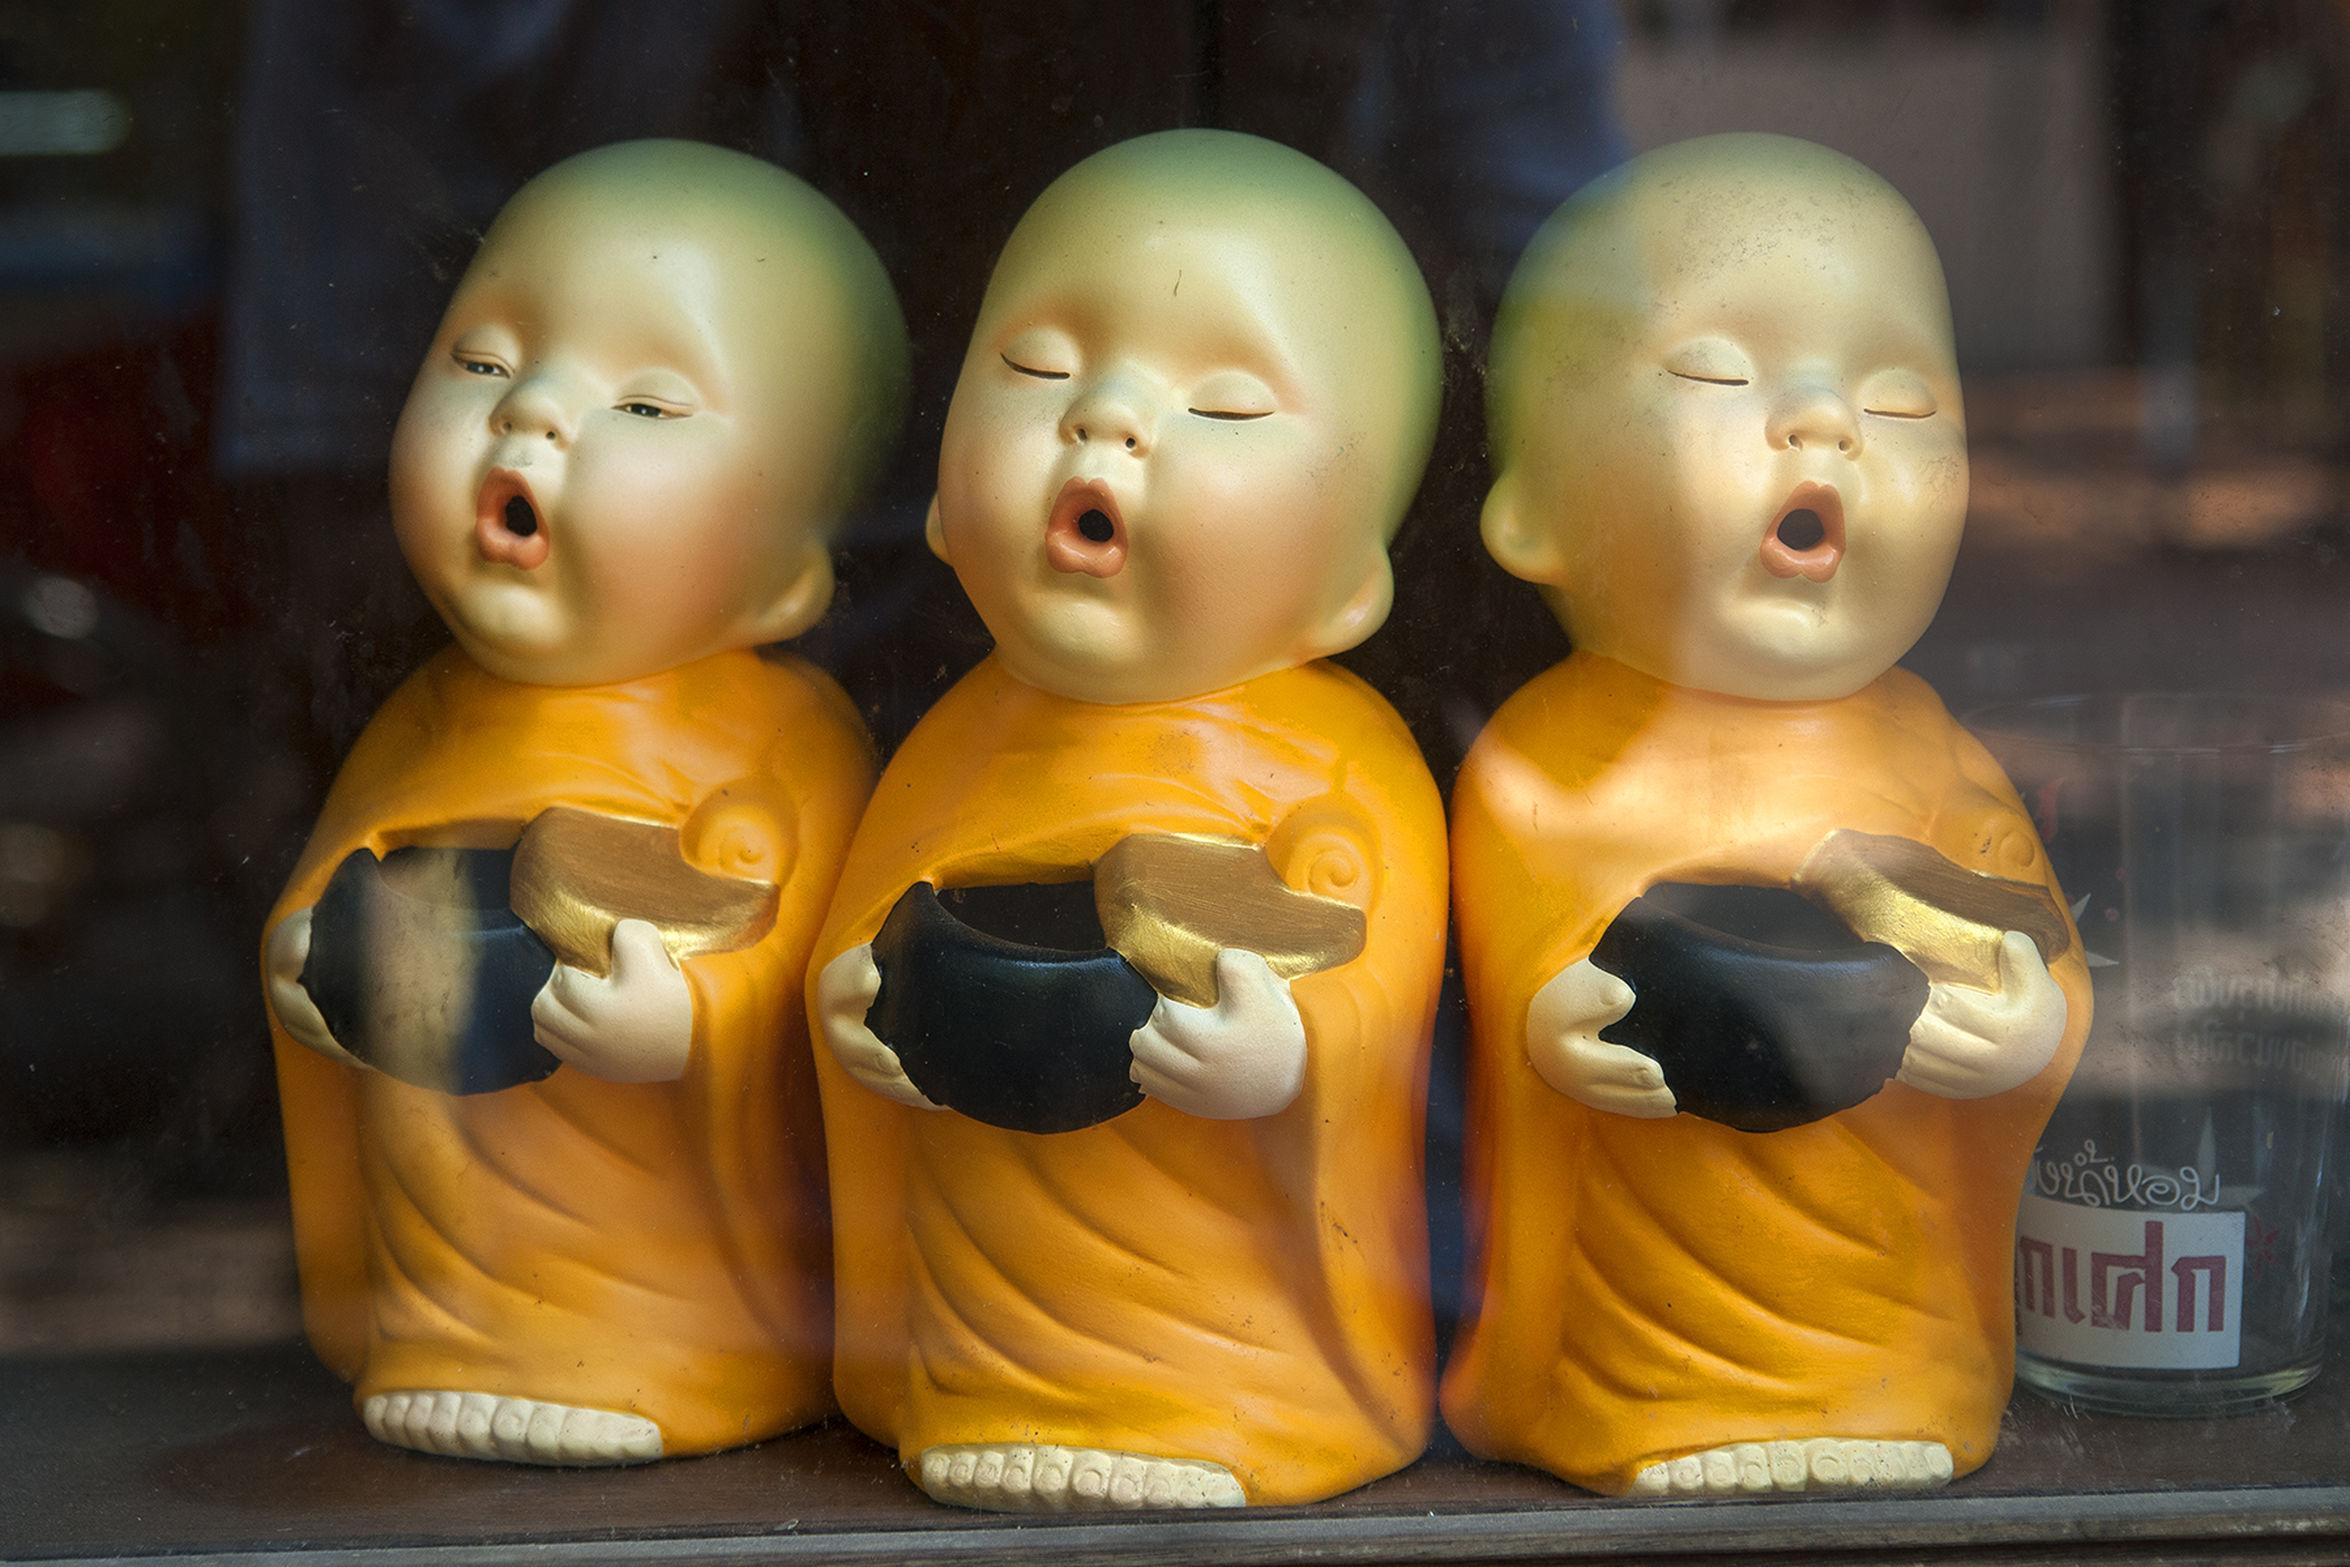 Arrangement Close-up Day Human Representation Indoors  Little Monks Mannequin No People Retail  Statue Still Life Store